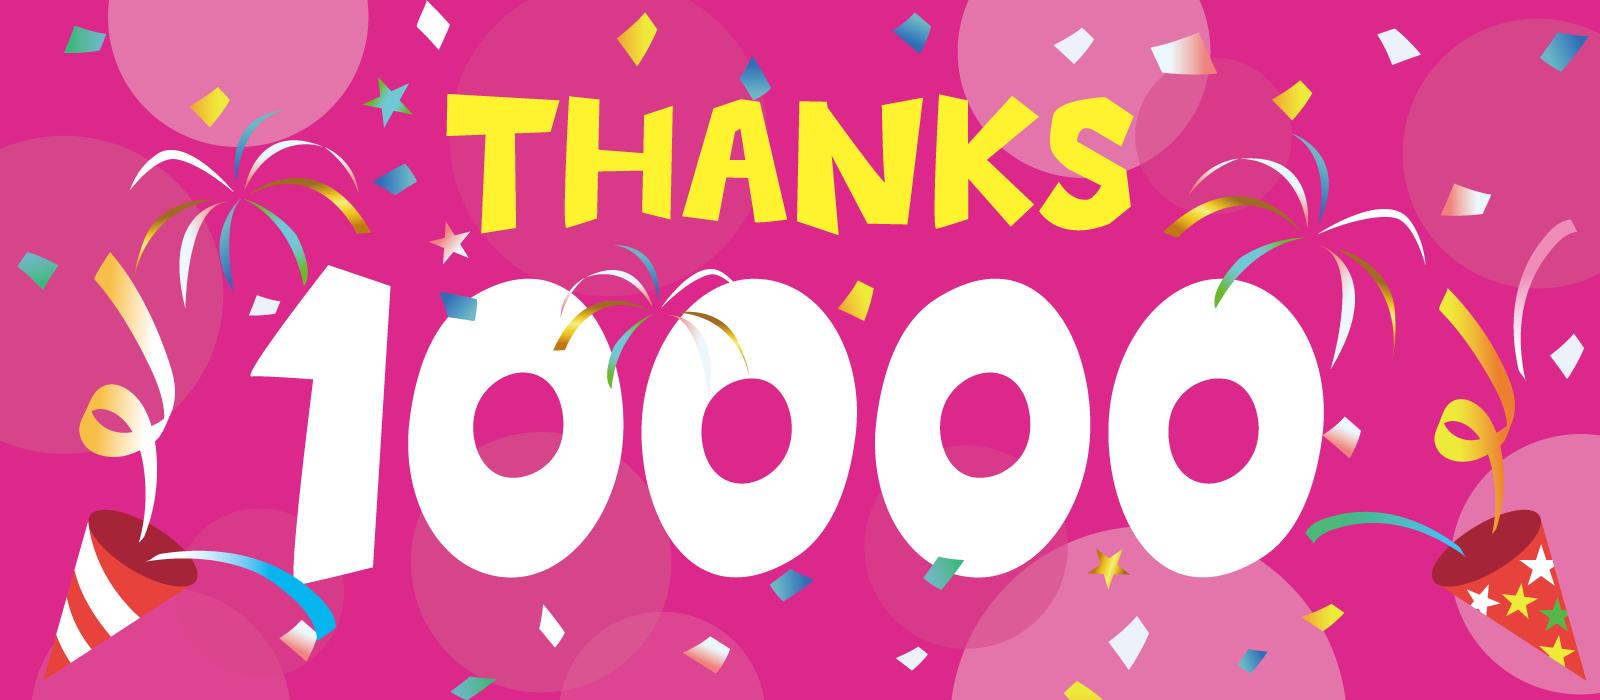 i000579_thanks_10000_pink